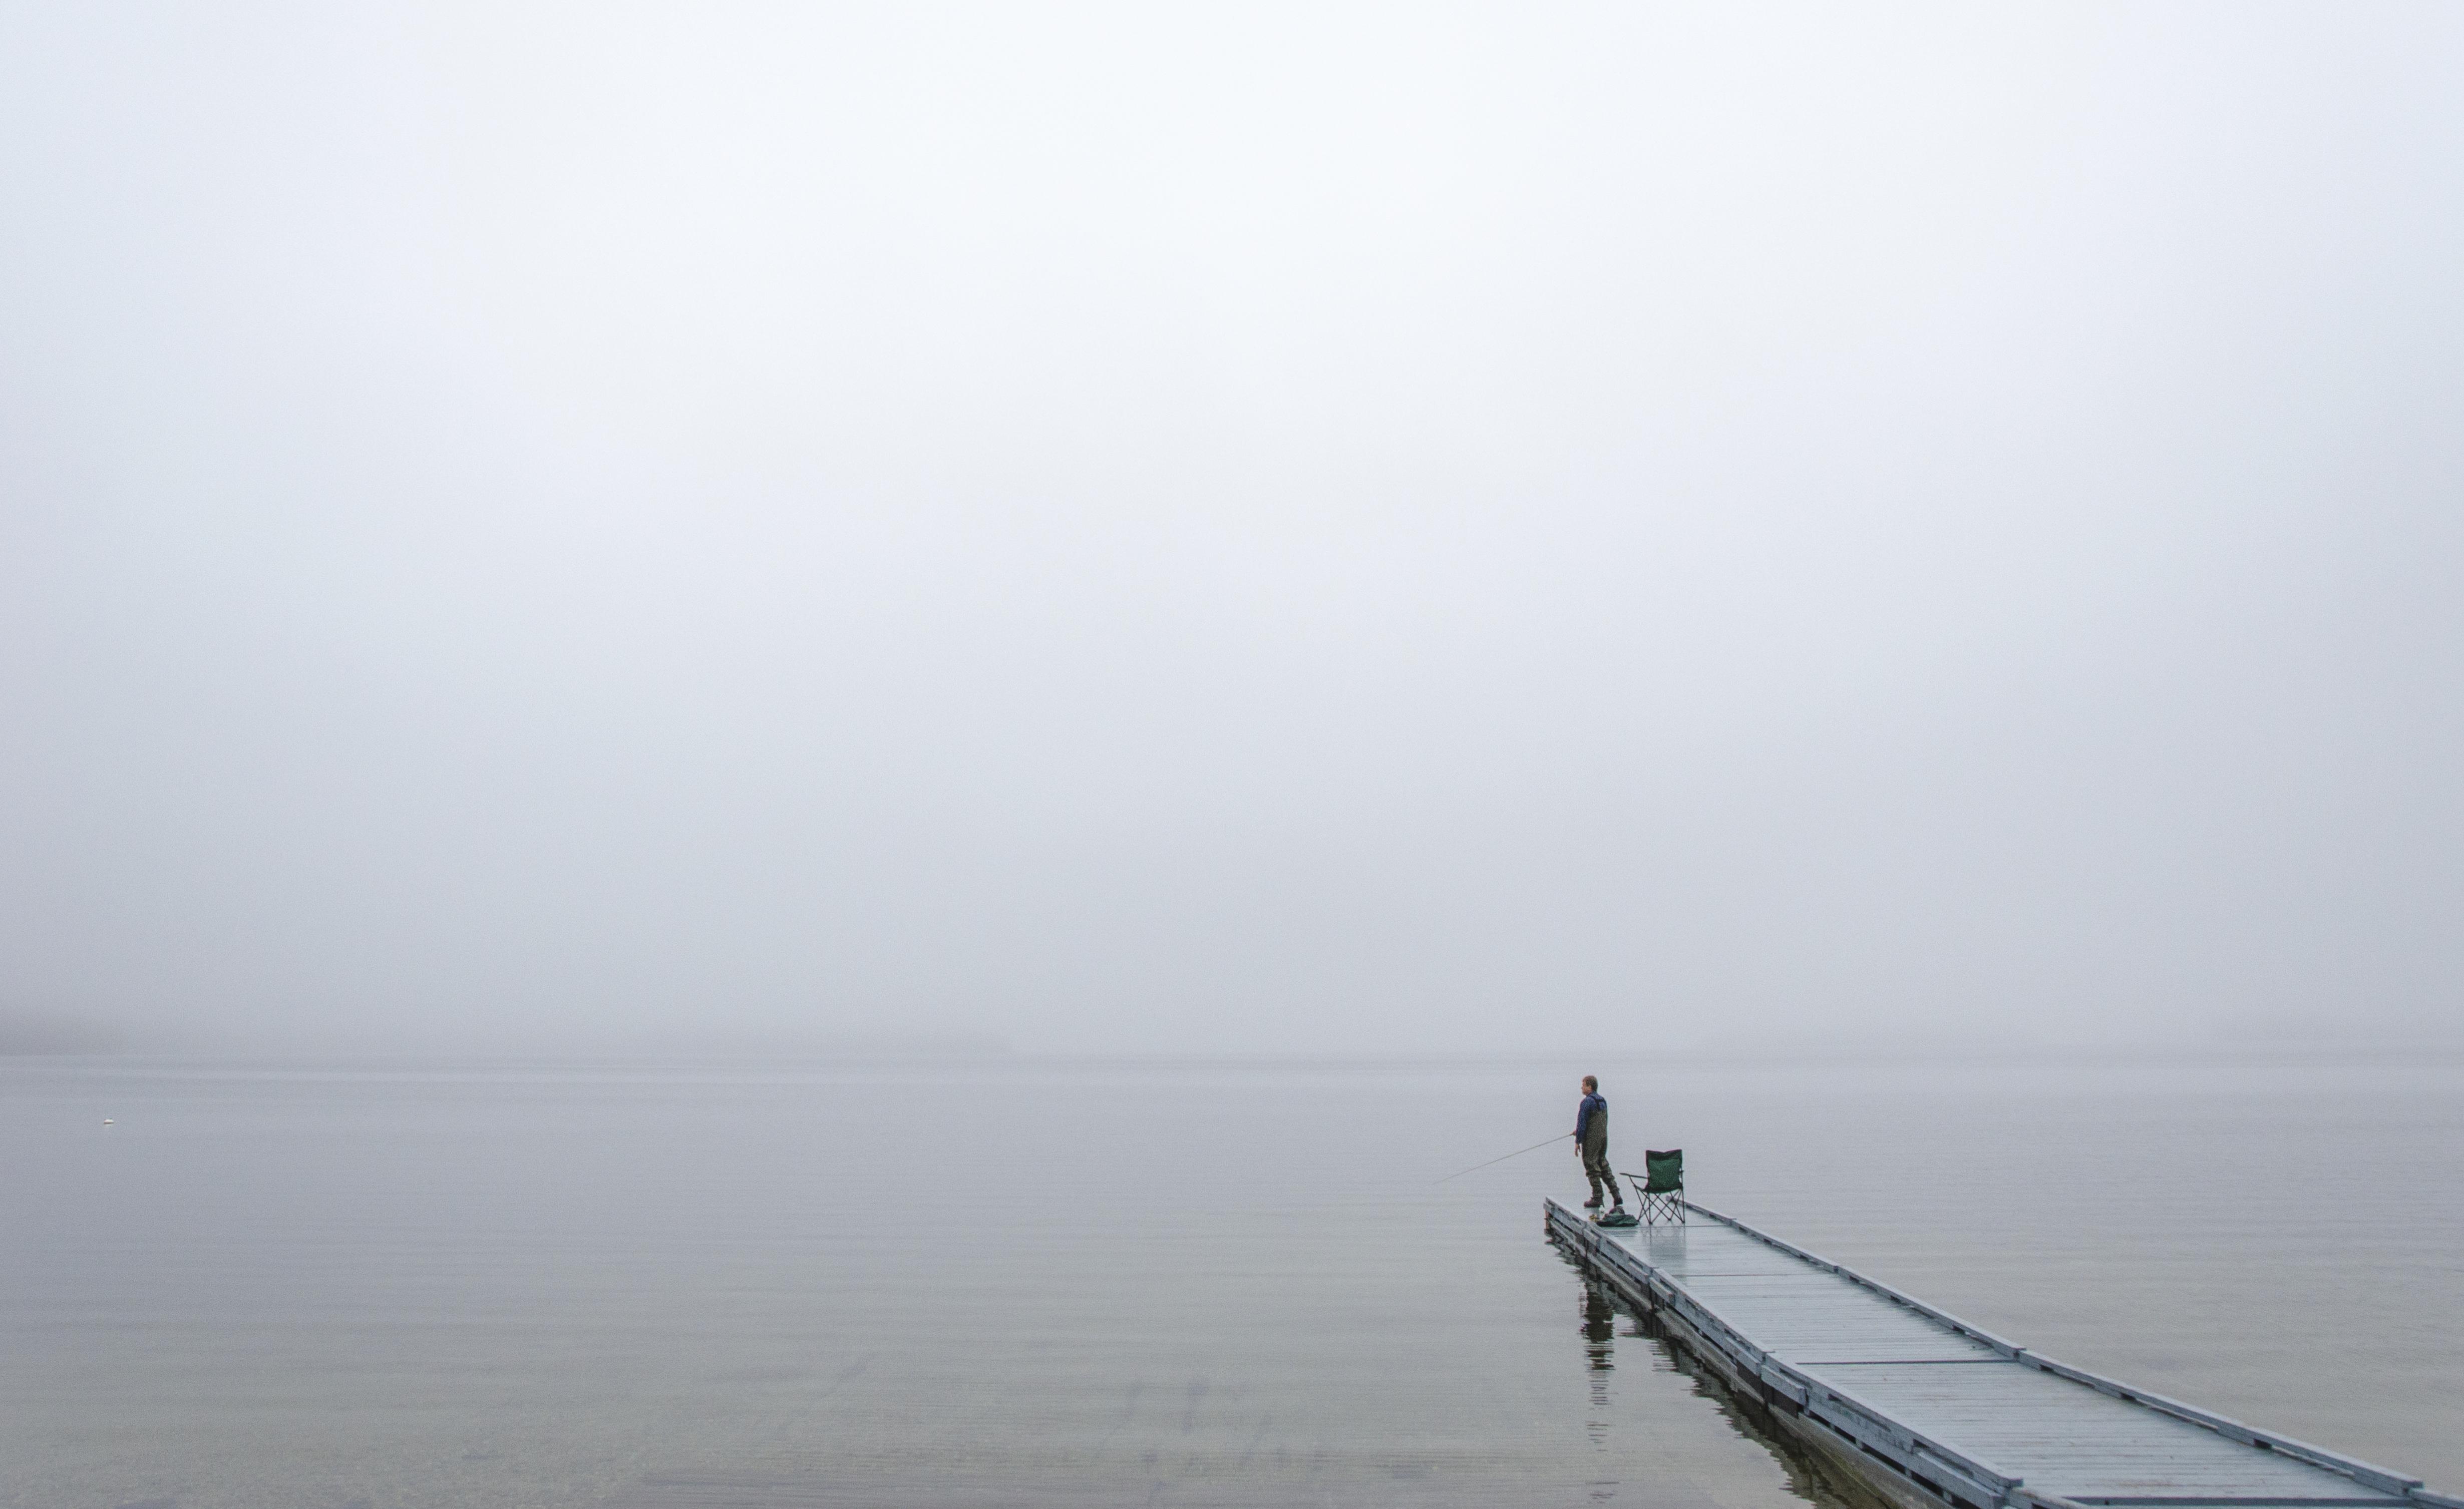 Serene Nikond5100 Newengland Fishing Lake Minimal Simple Maine Gray Grey Muted Moody Peace Peaceful Calm Fog